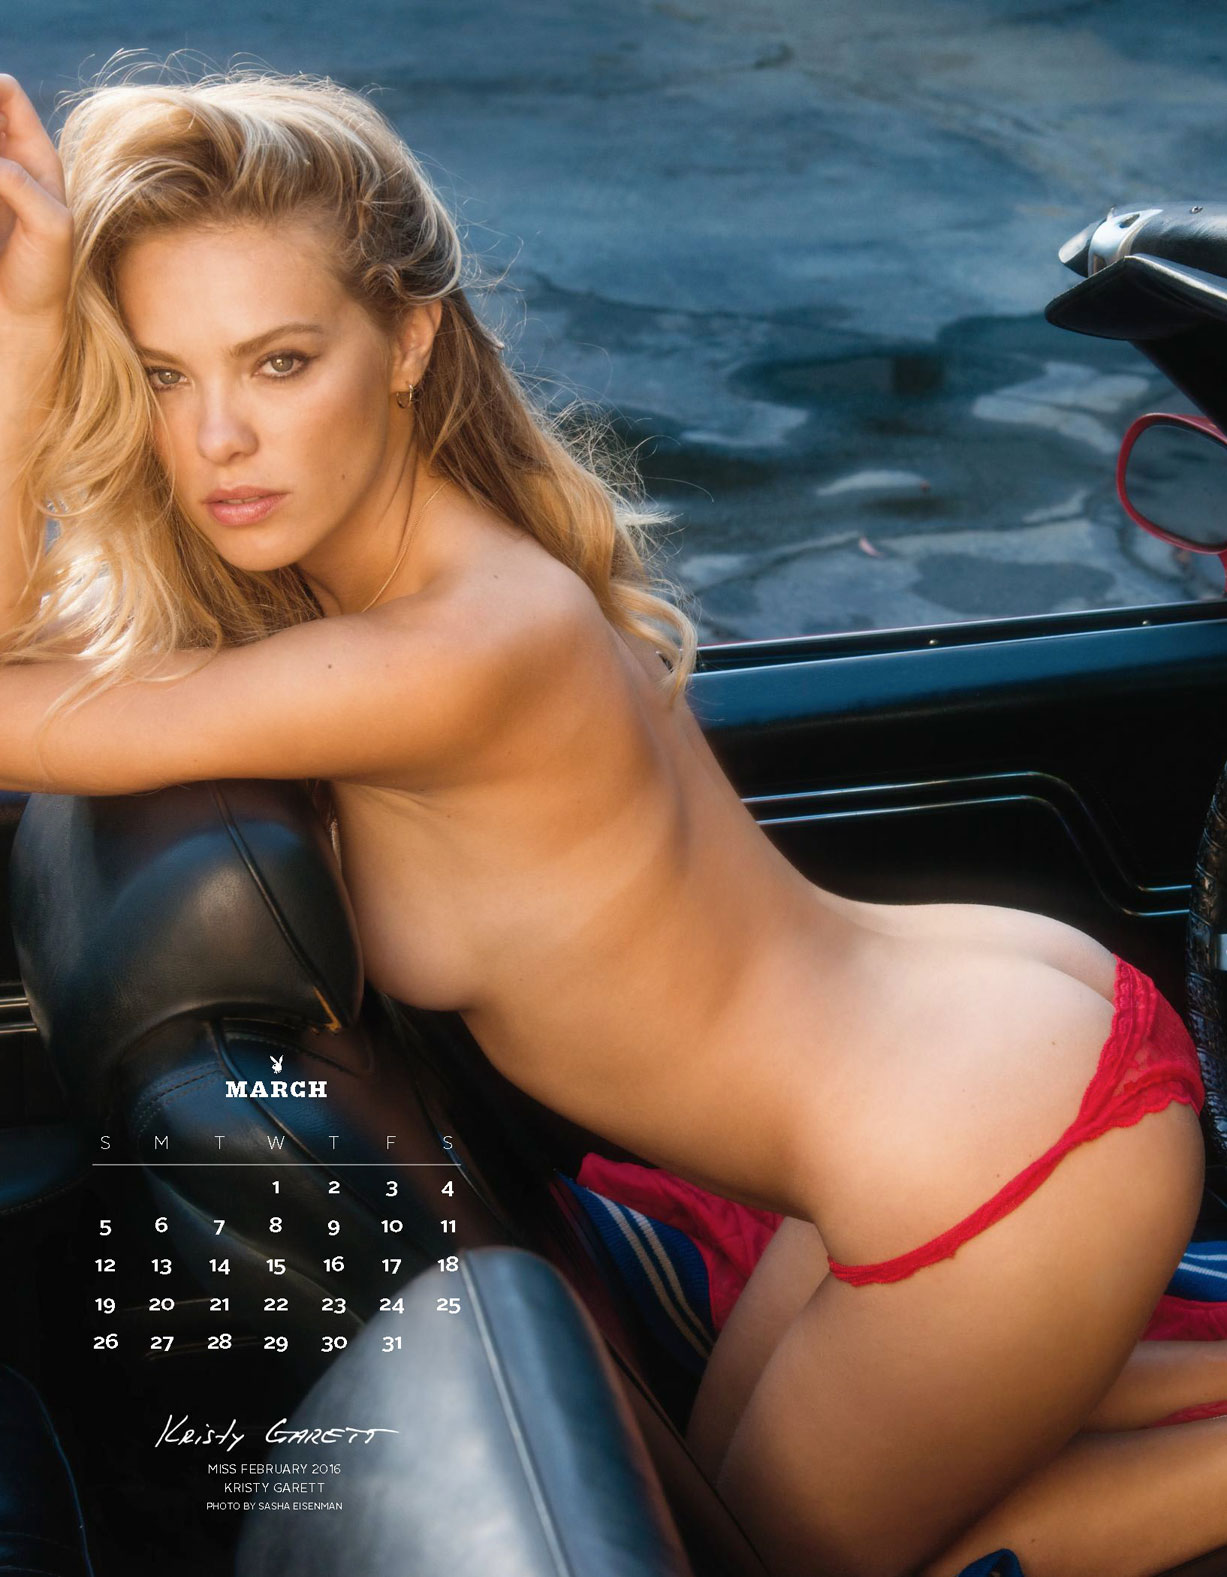 Playboy US Playmates 2017 calendar - Miss February 2016 Kristy Garett / Кристи Гаретт – Девушка месяца февраль 2016 журнала Плейбой США